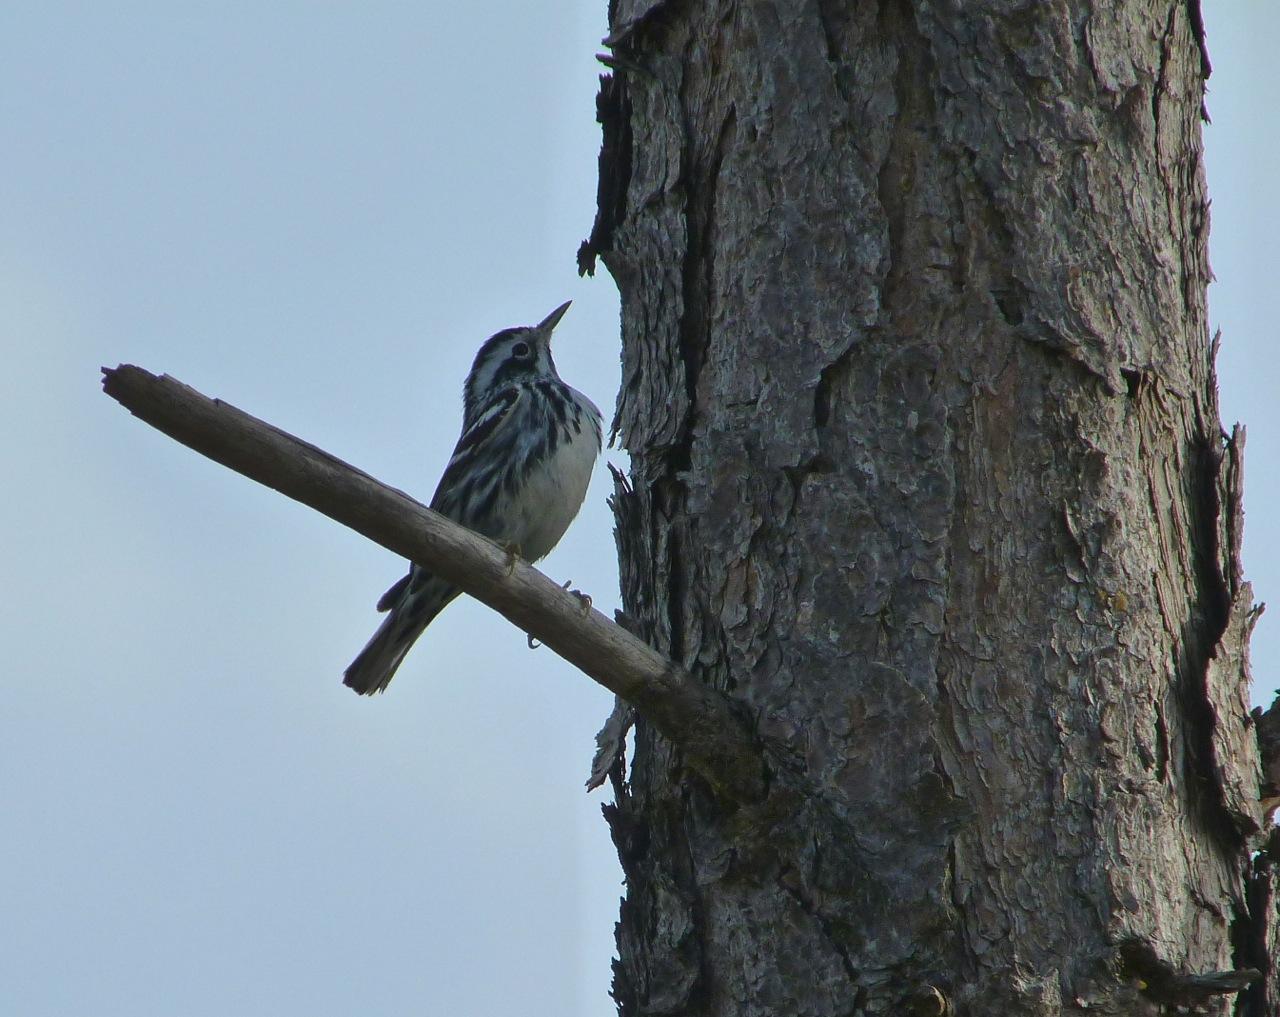 Black & White Warbler, Abaco, Bahamas 2